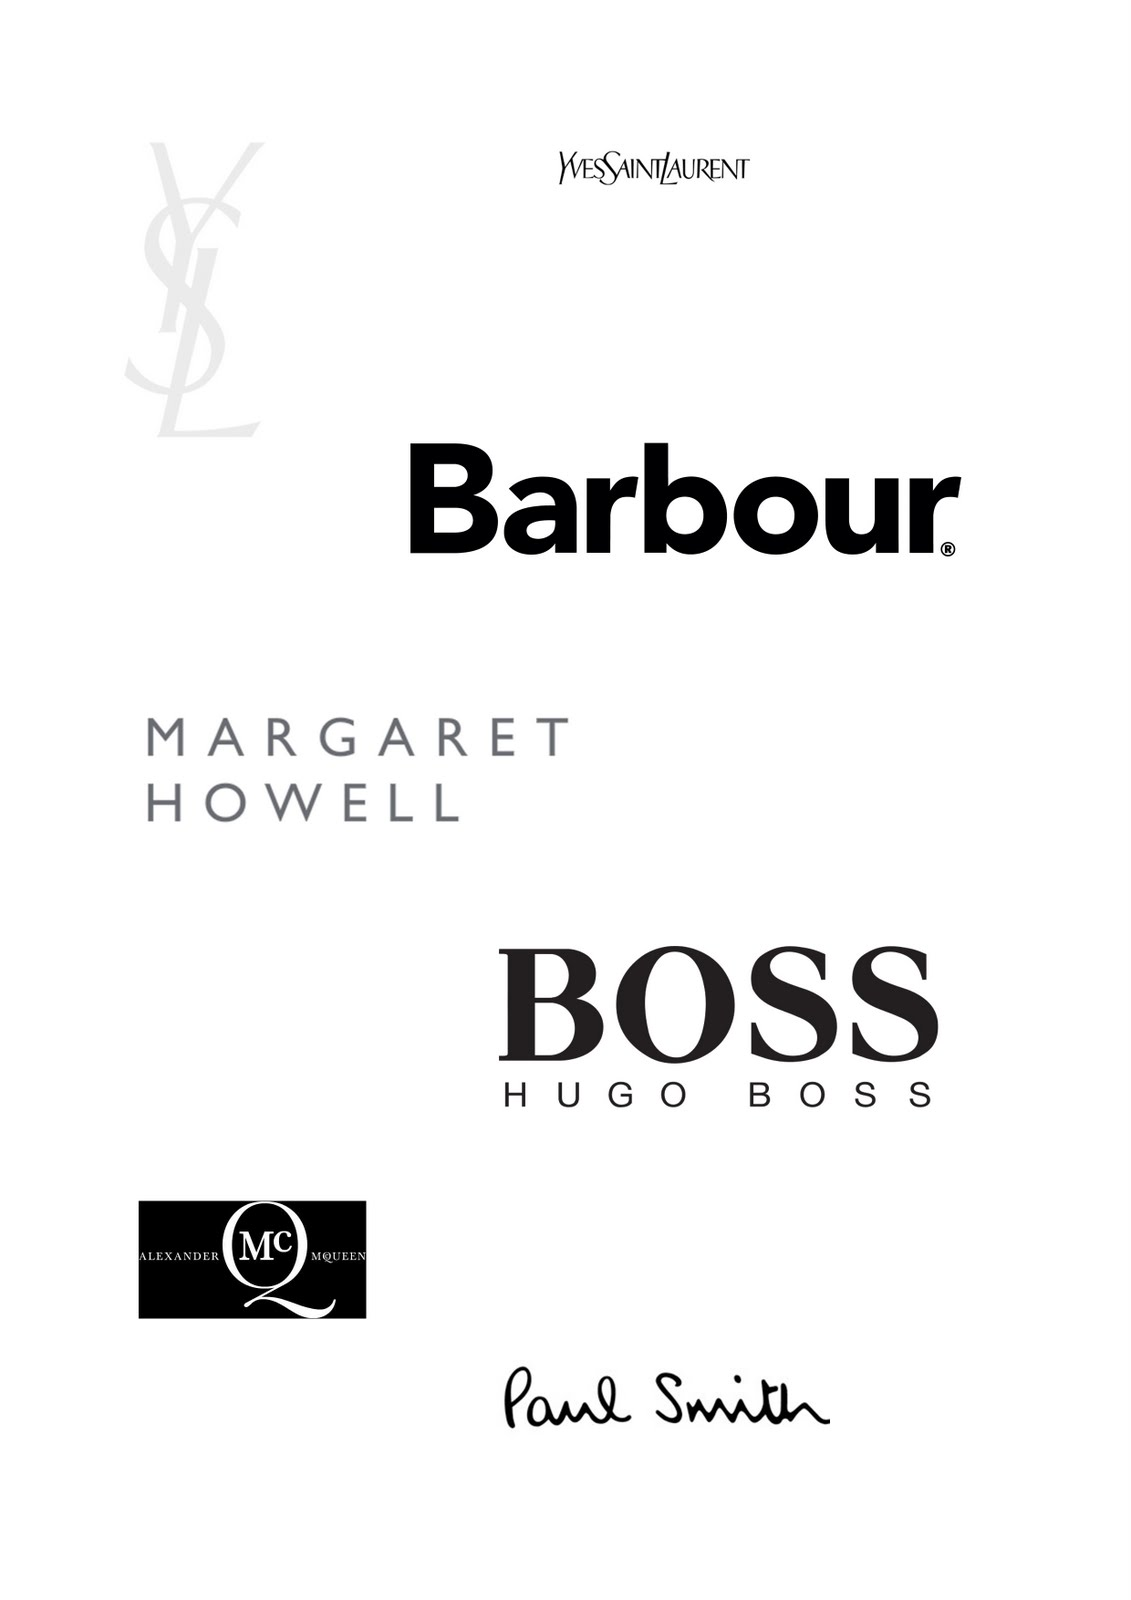 high fashion logo design - photo #21